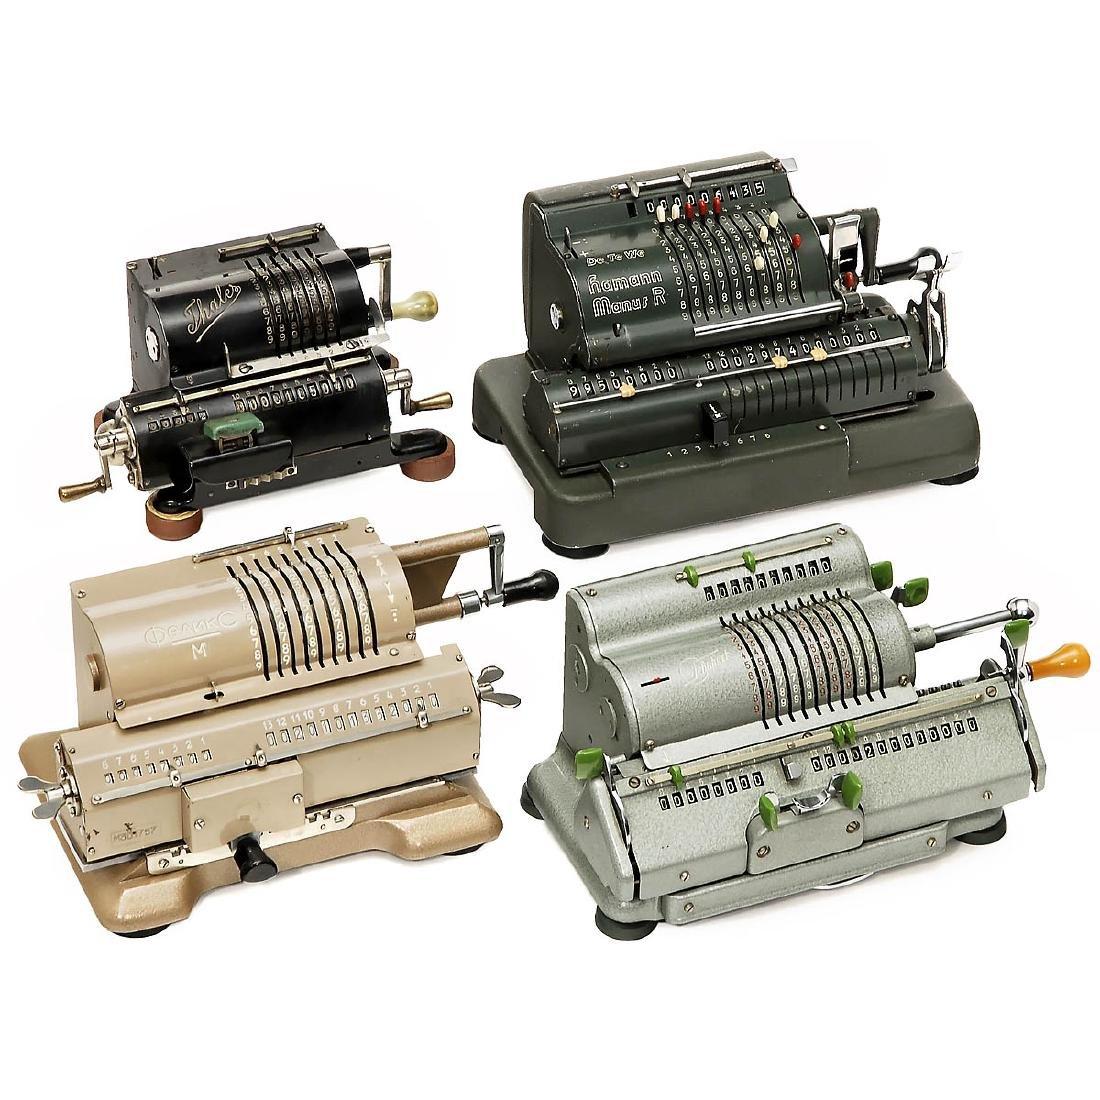 4 Spokewheel Calculating Machines